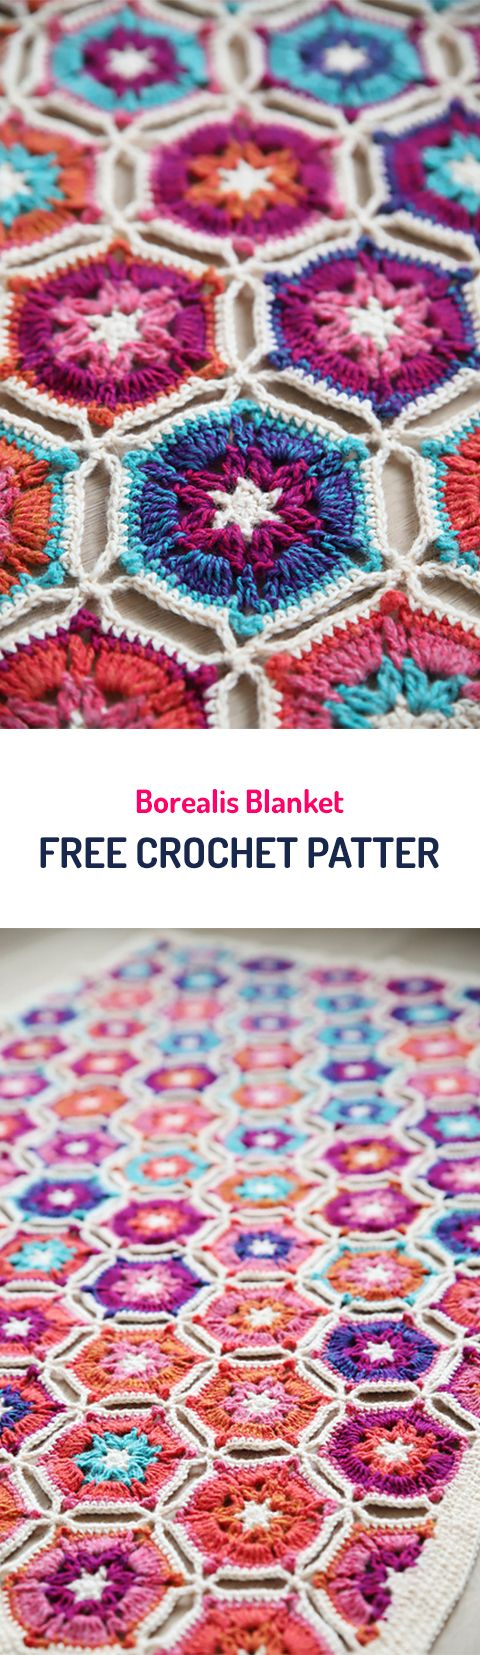 Borealis Blanket Free Crochet Pattern #crochet #diy #style #crafts #homedecor